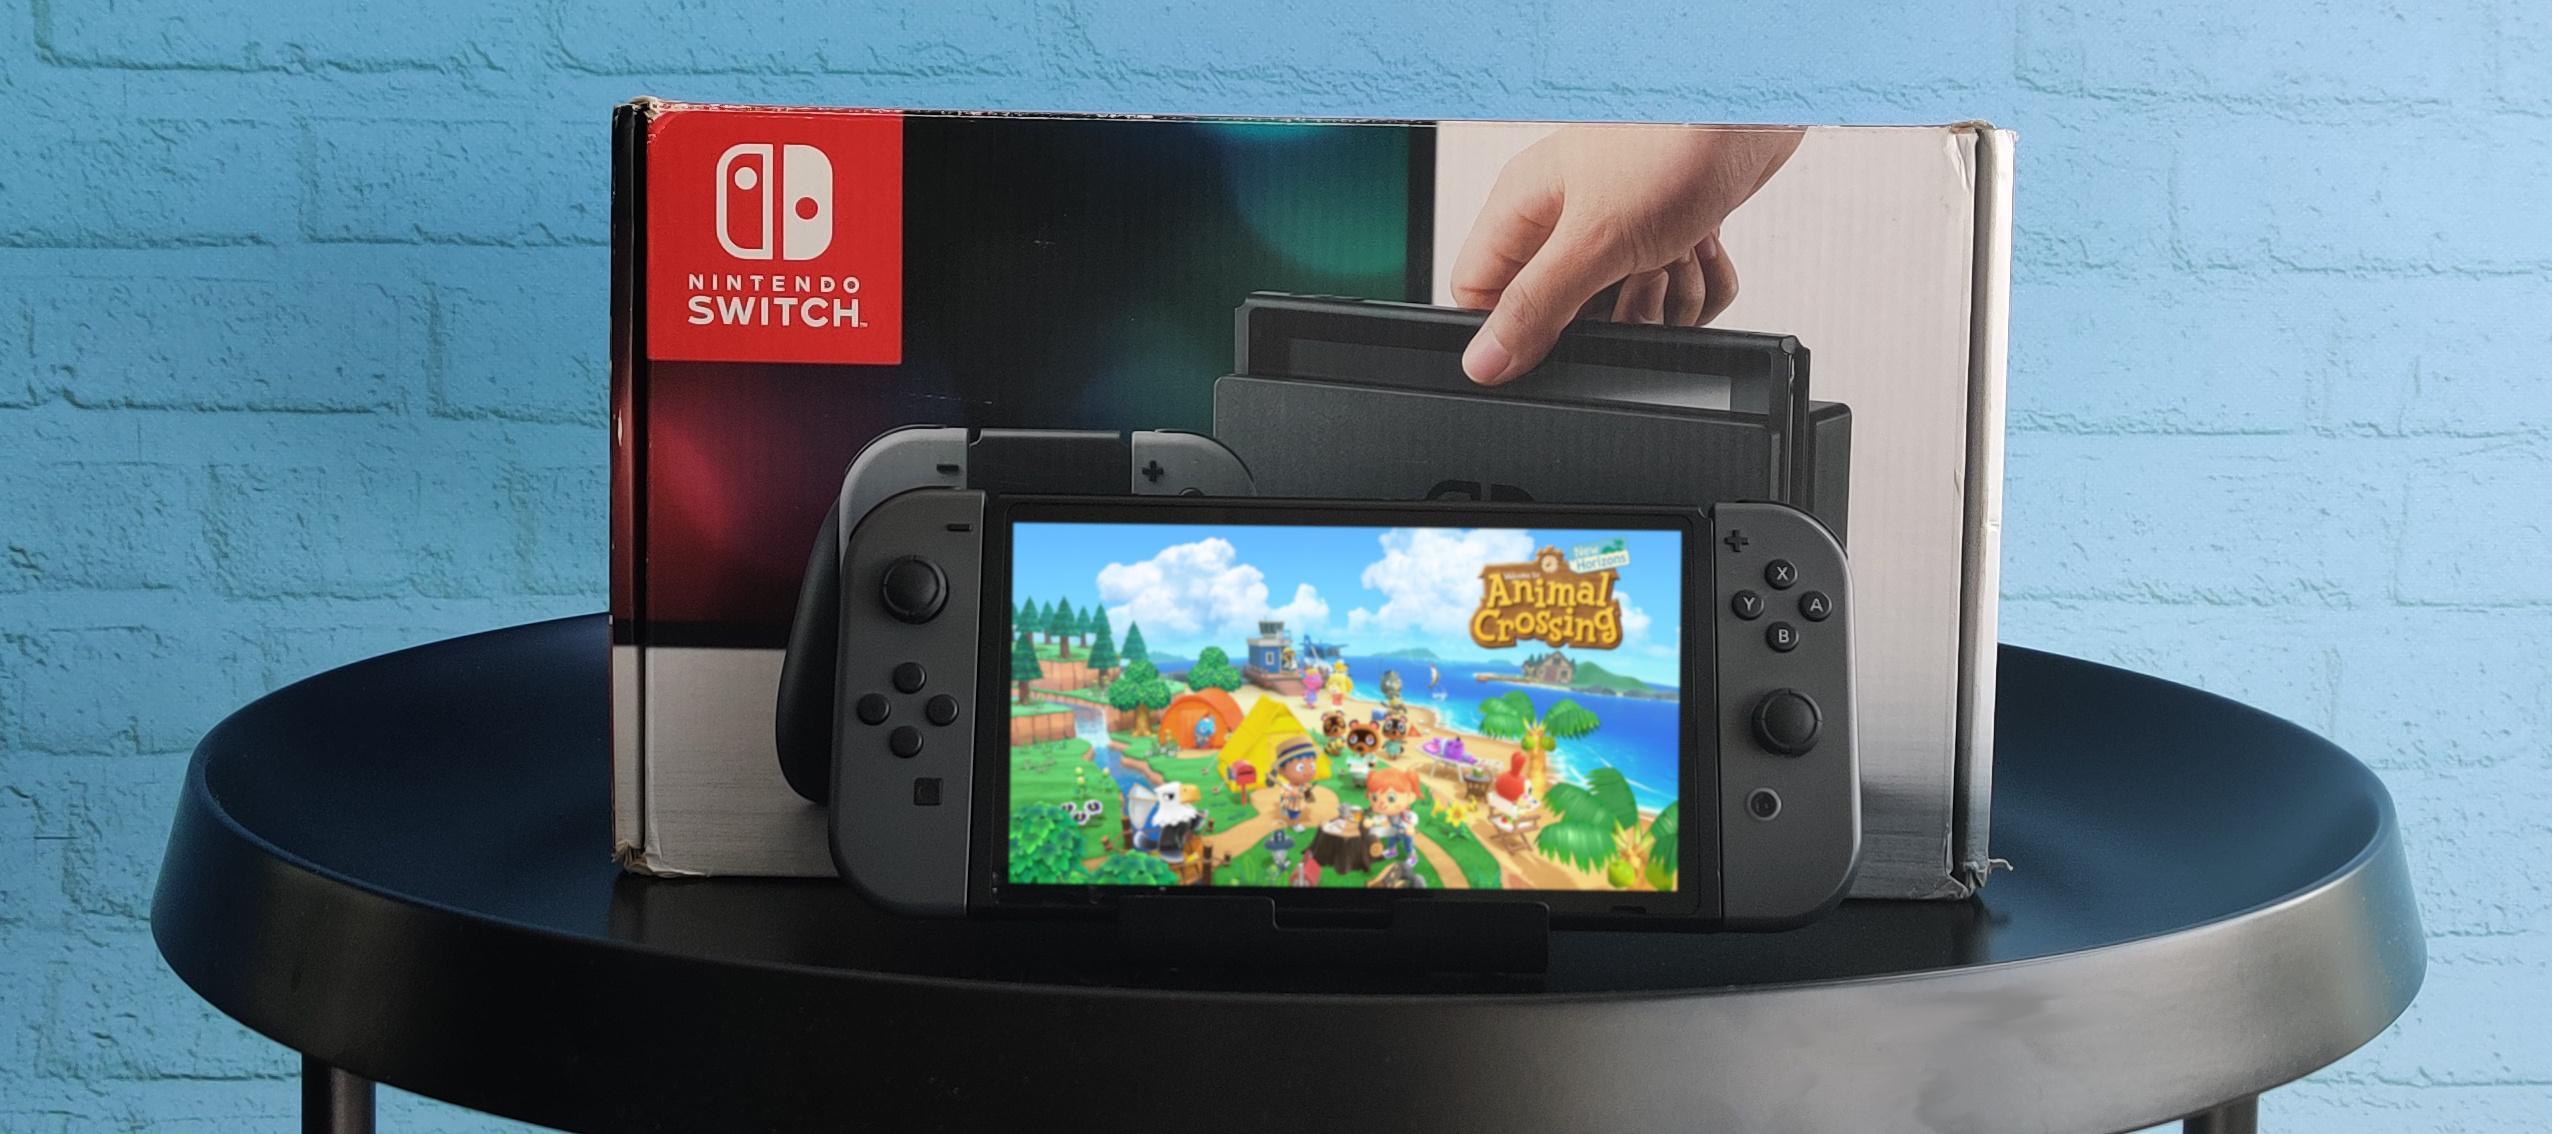 Nintendo Switch inkl. Animal Crossing: New Horizons Testgerät: Jetzt bewerben und Tester/in werden!